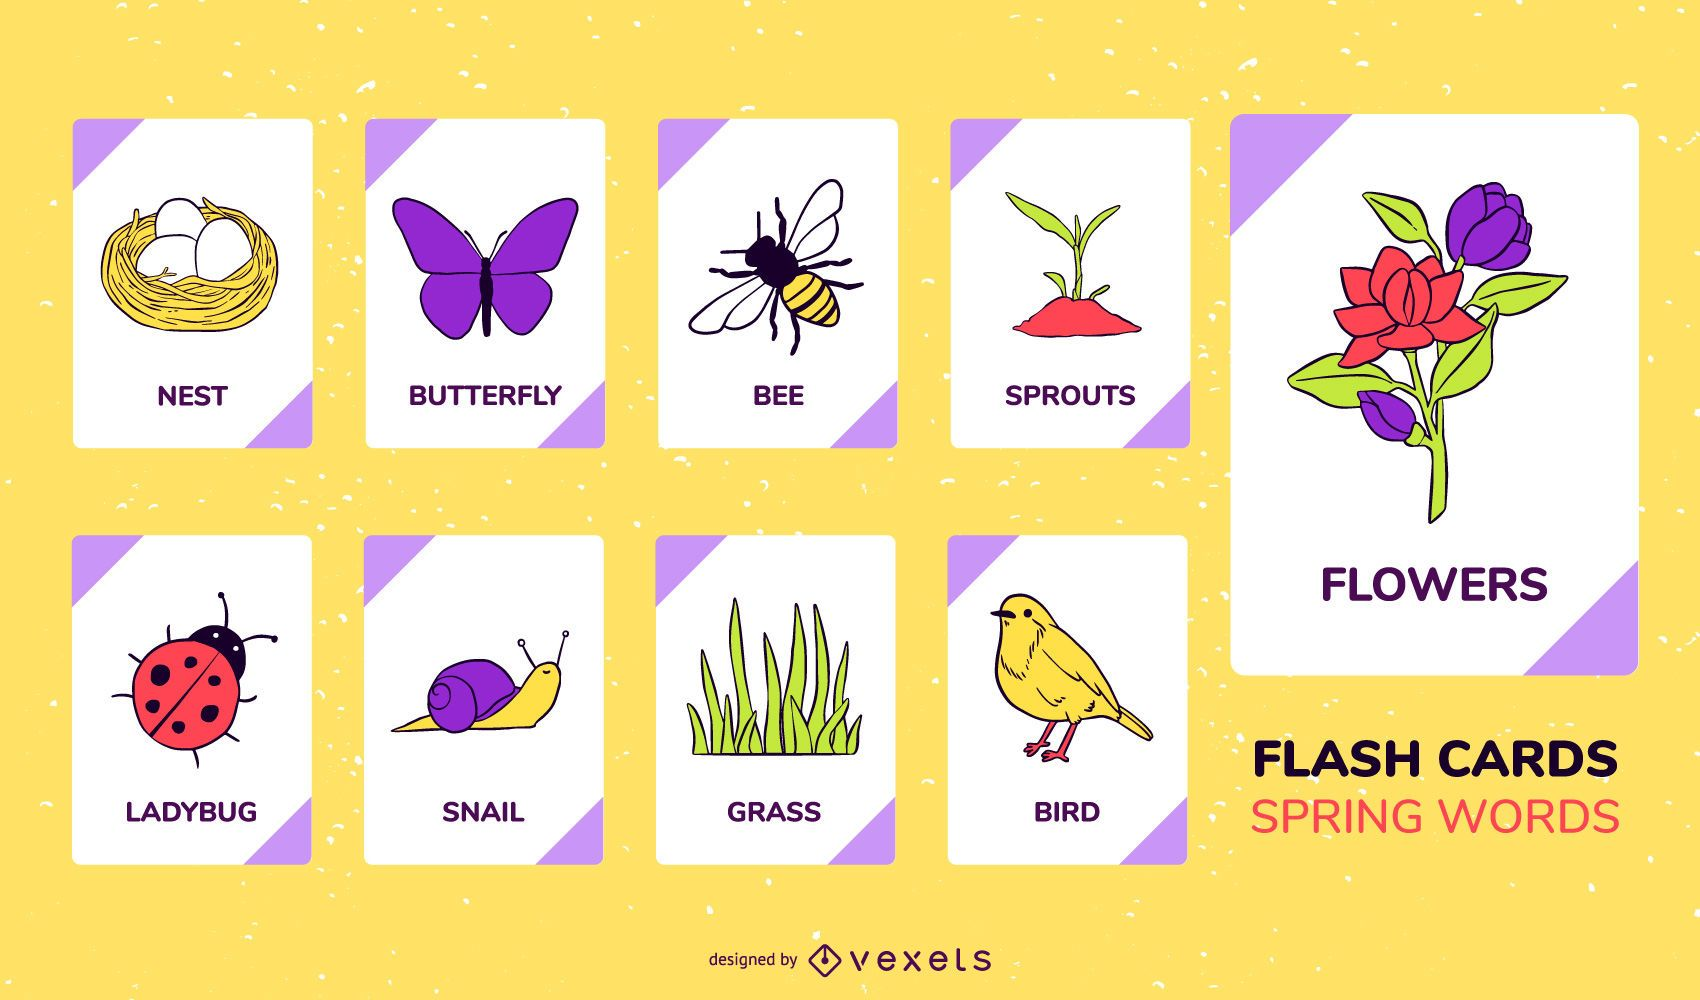 Spring elements flashcard set